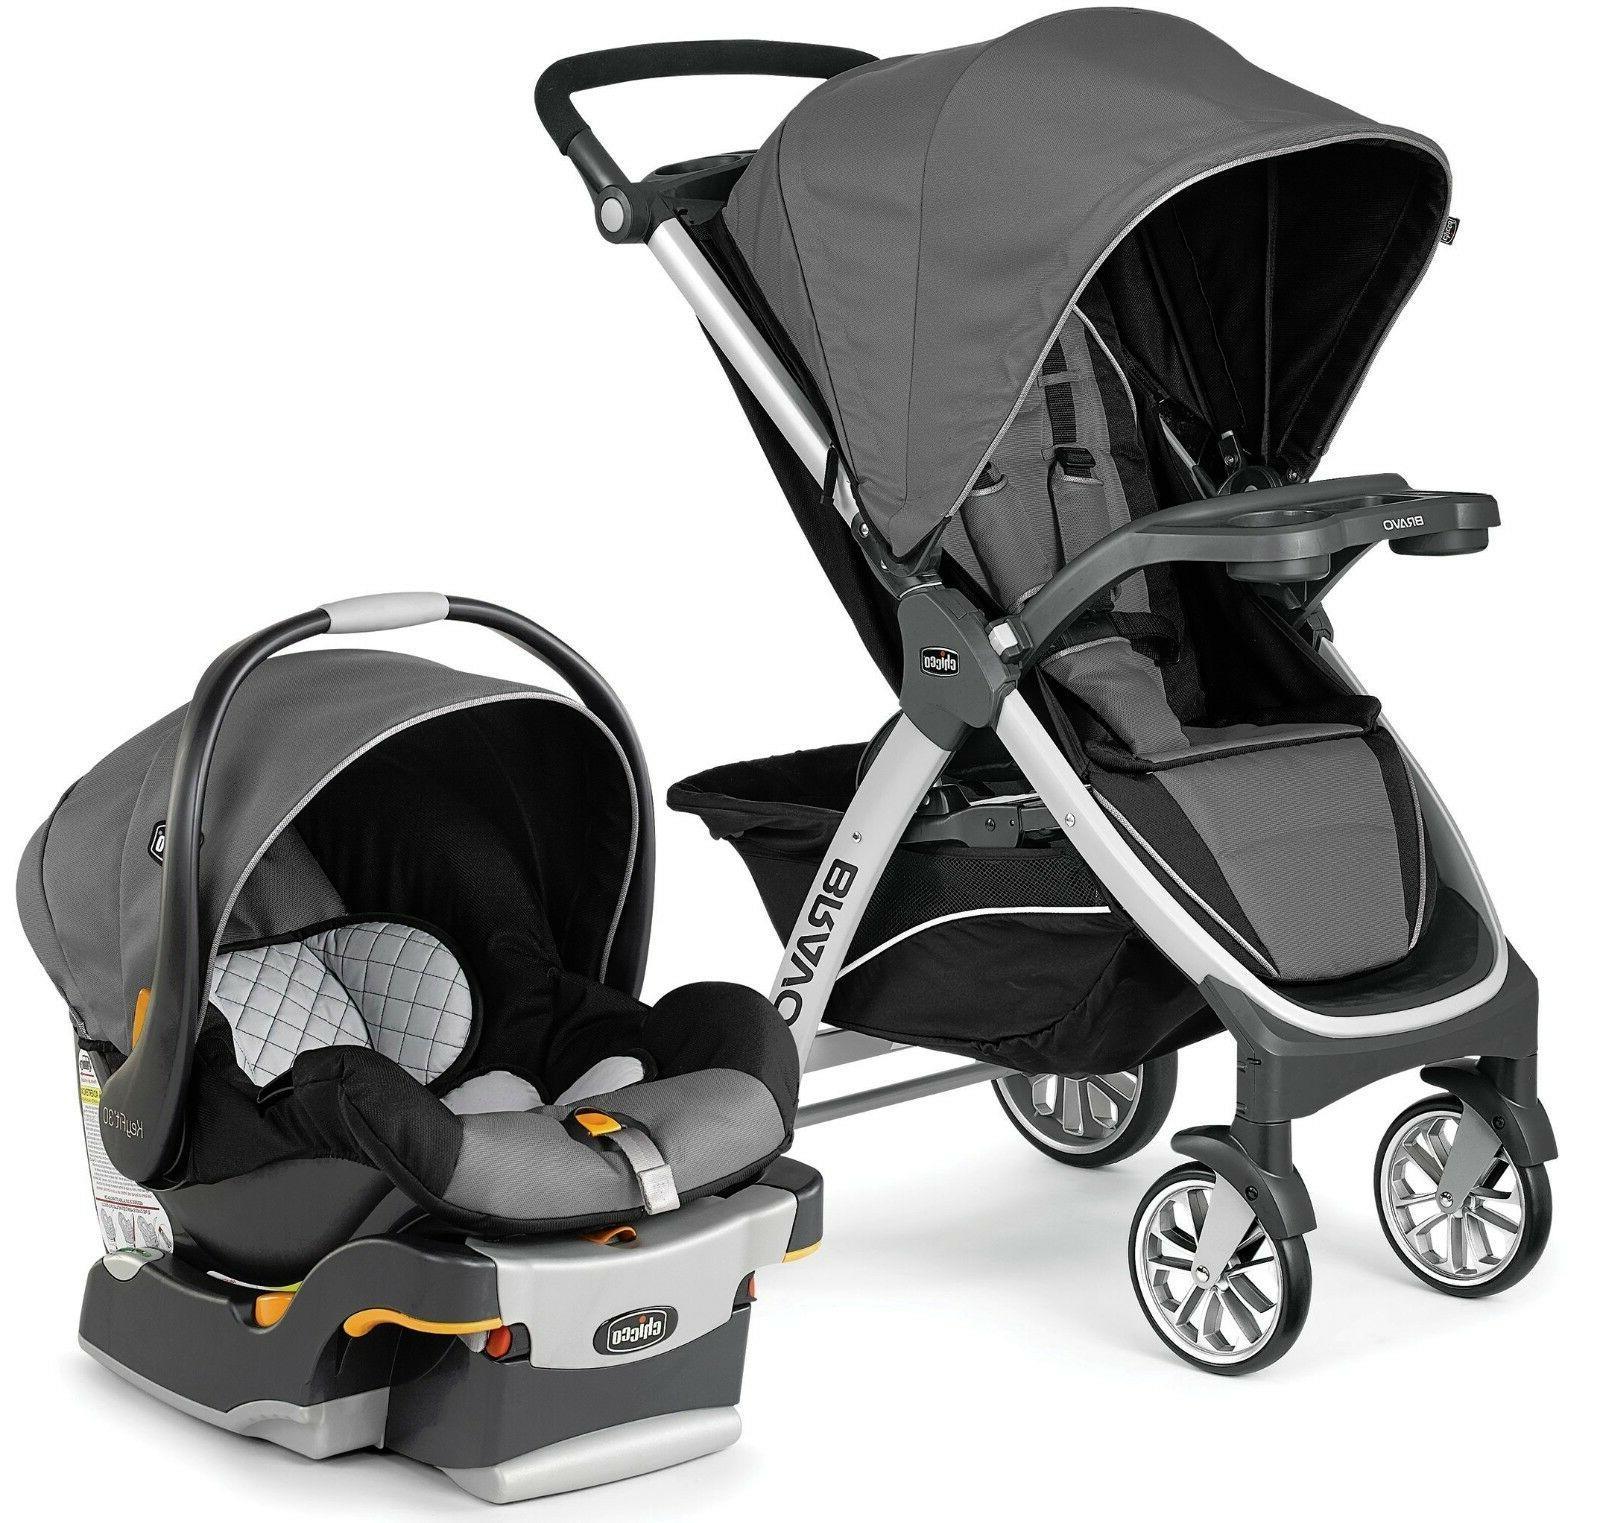 Chicco Bravo Trio 3-in-1 Baby Travel System Stroller w/ KeyF